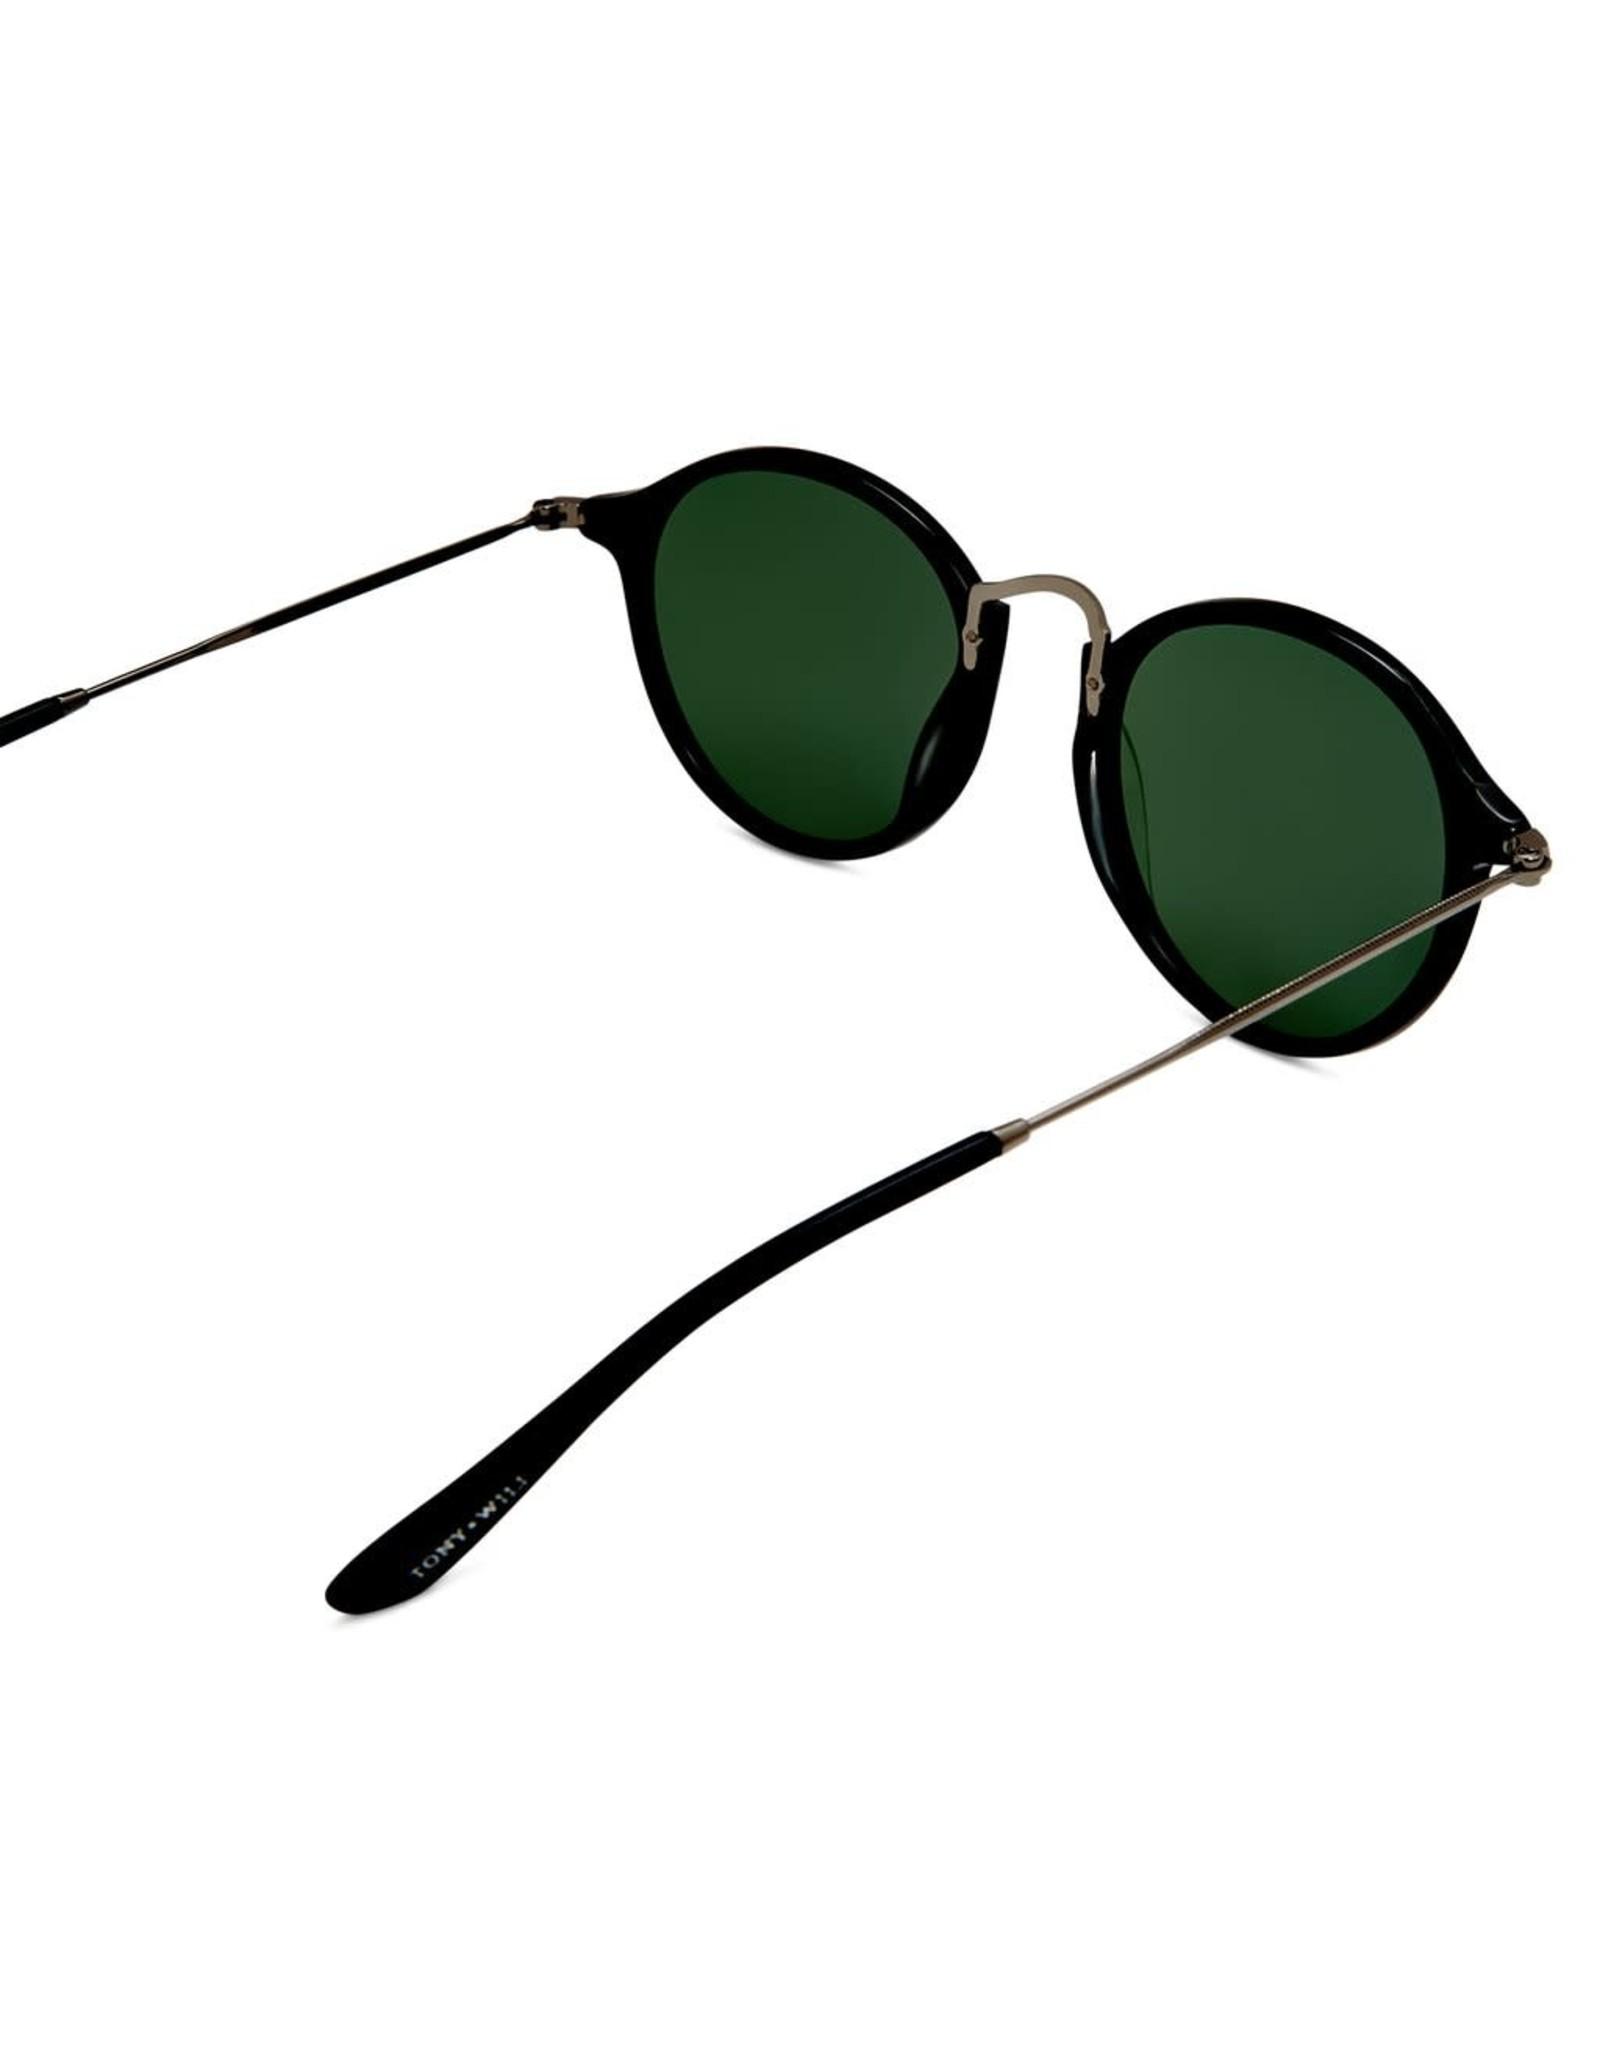 Amazon Polarised Retro Vintage Round Frame Sunglasses - Black